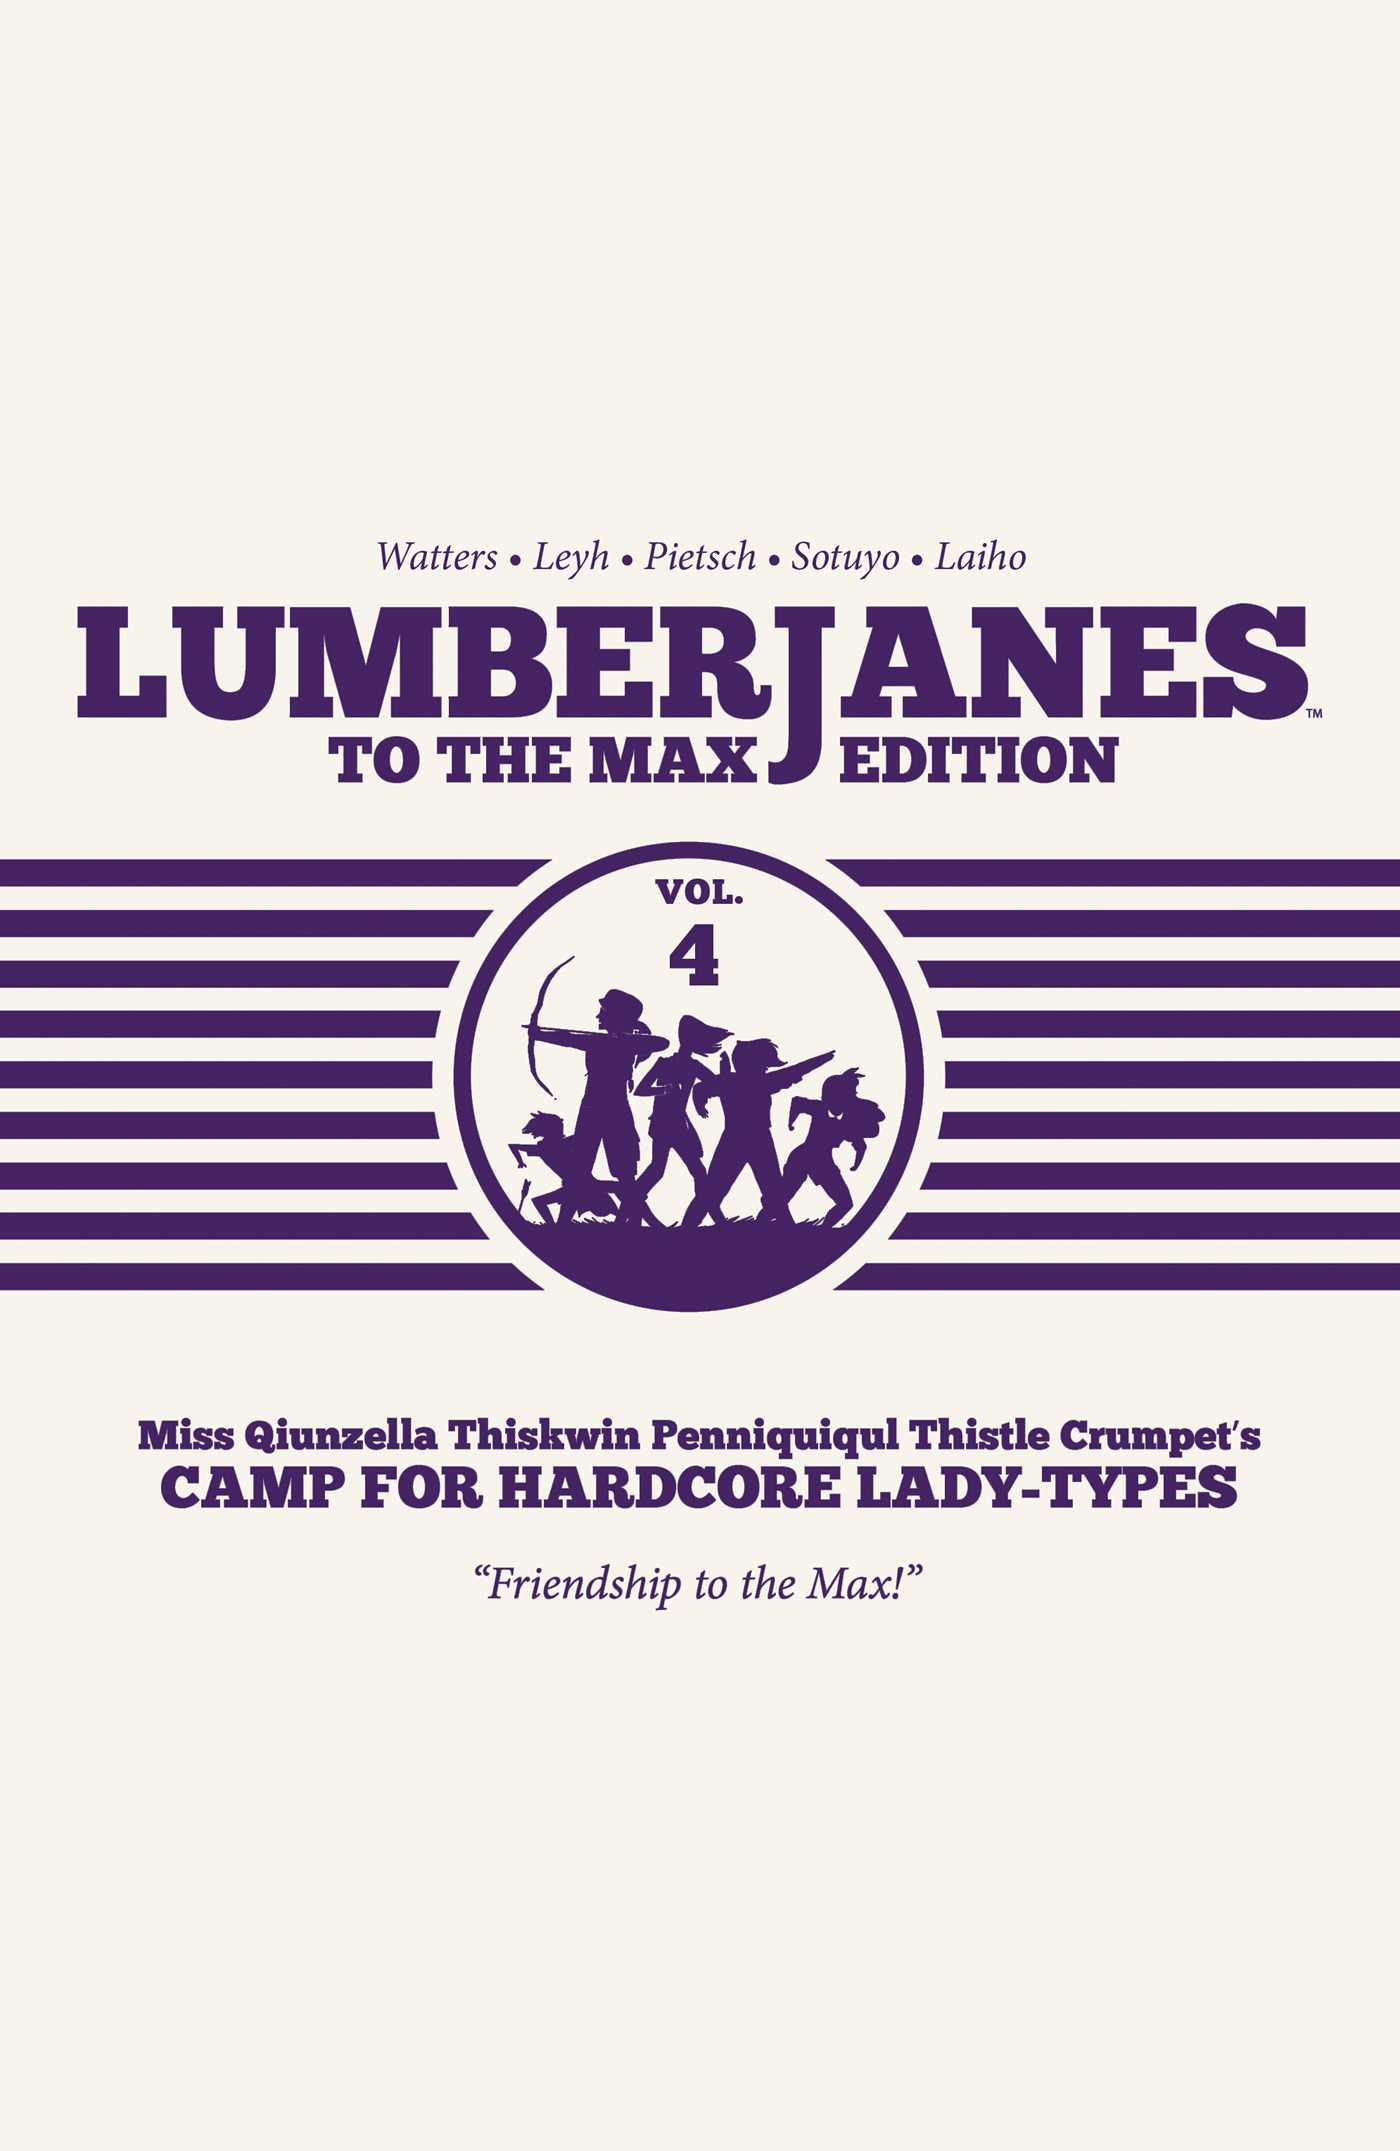 Lumberjanes to the max vol 4 9781684151837 hr